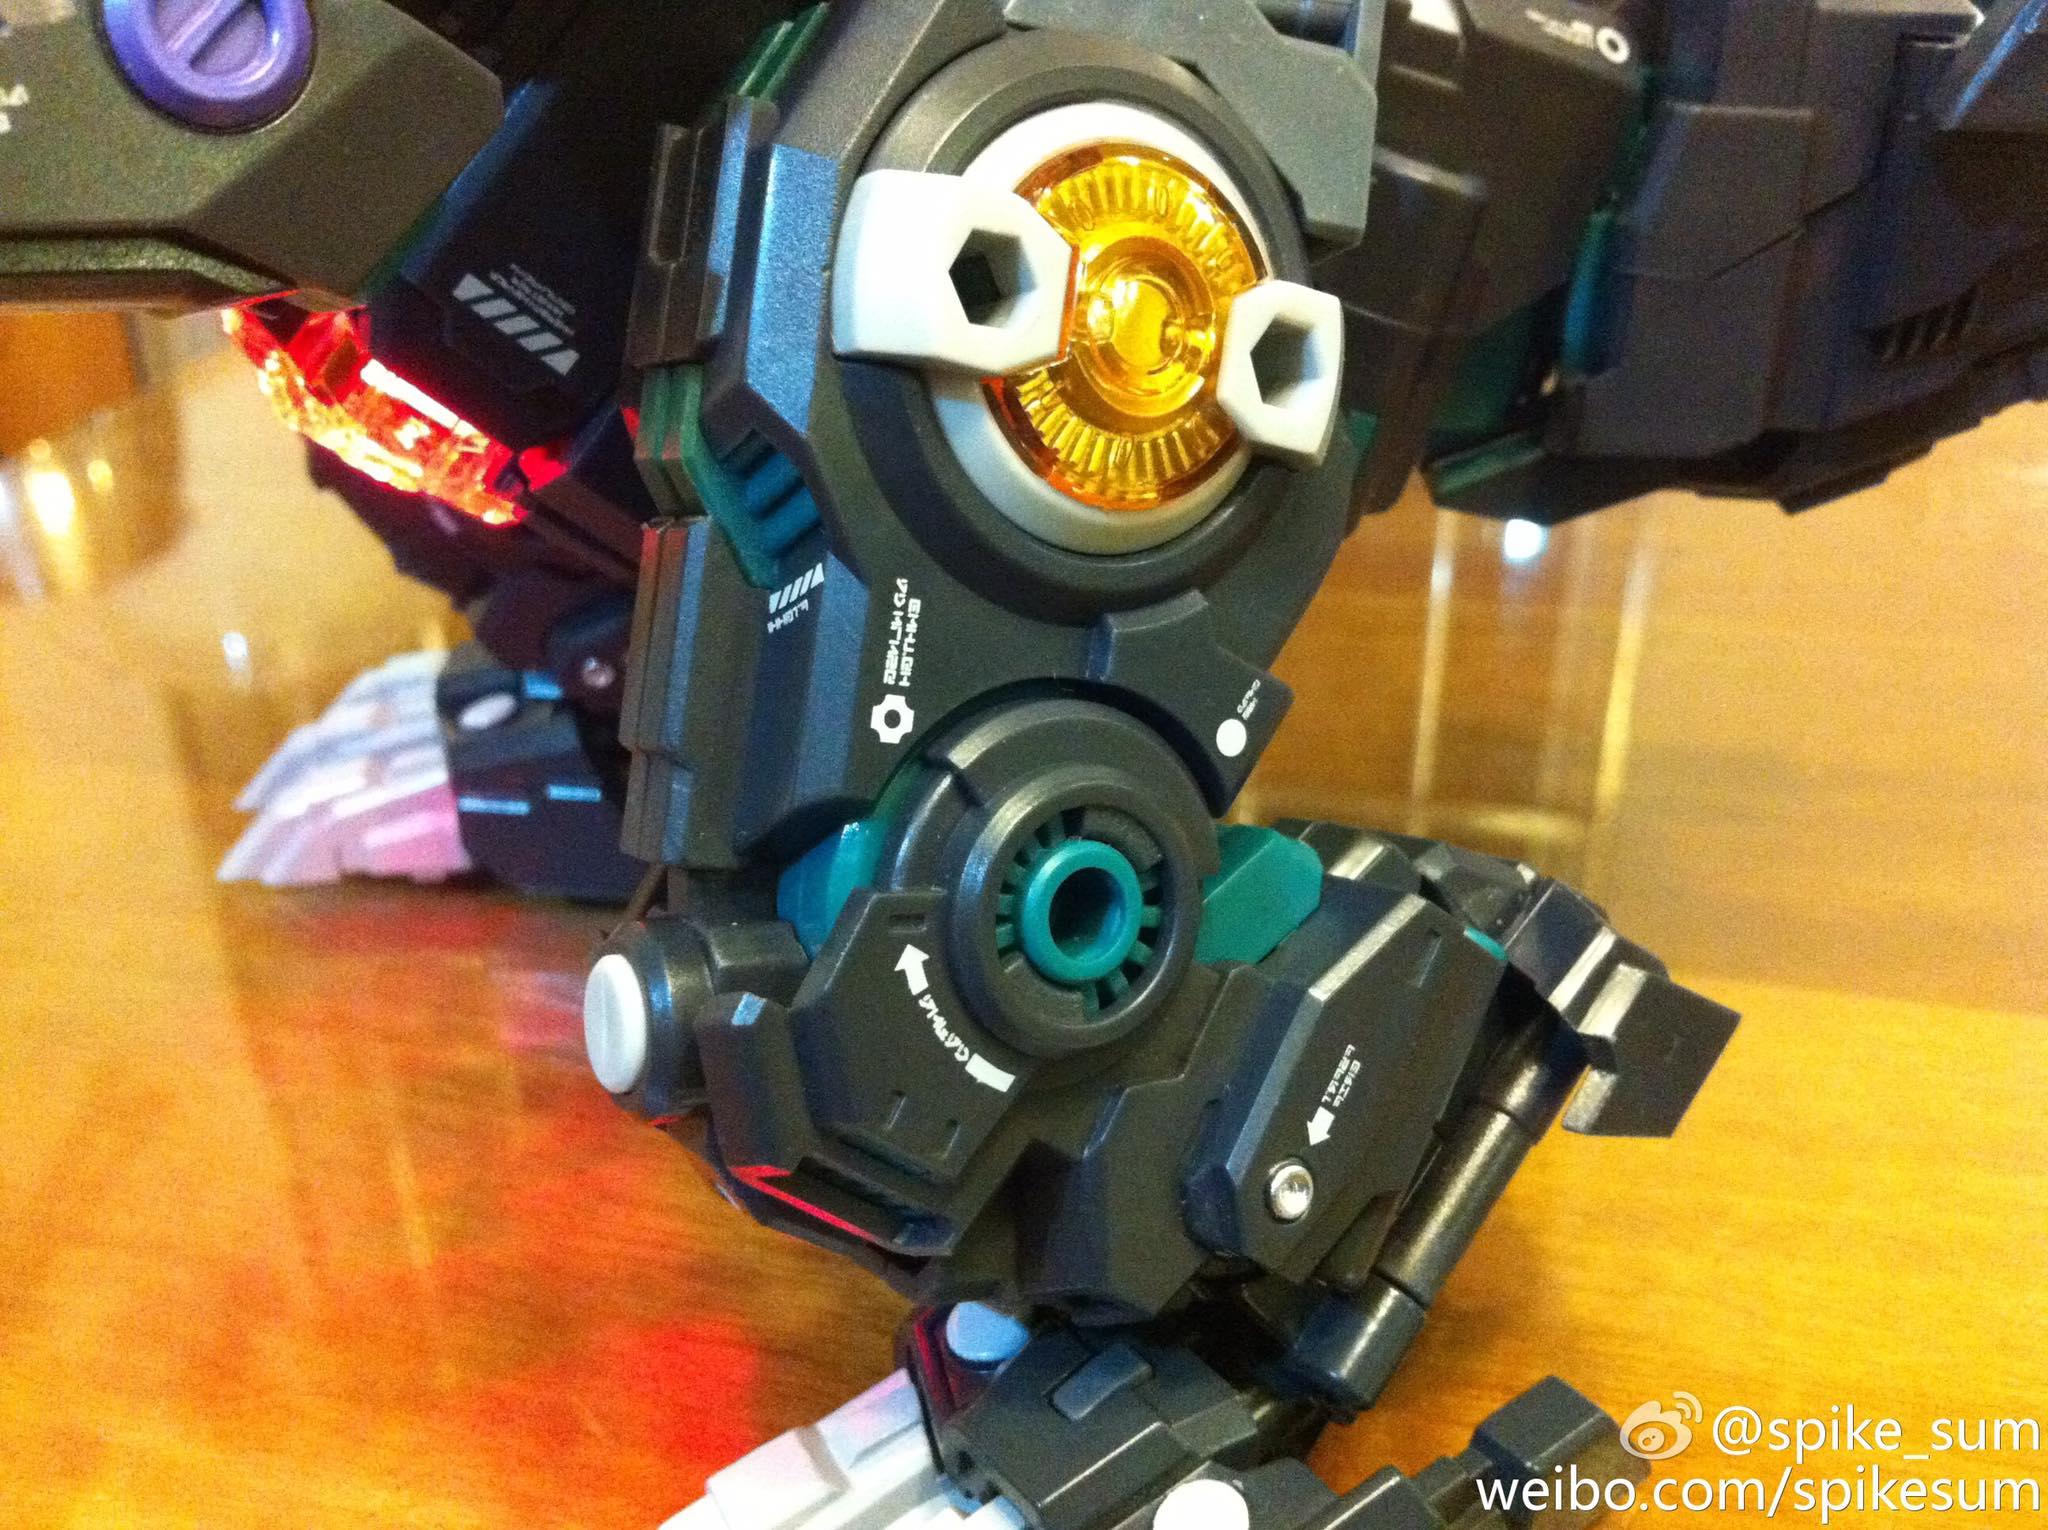 Produit Tiers - Figurine miniature déformé (transformable) - Par: Hero Hobby + MiniPower + Master Made Diabolus-Rex-02